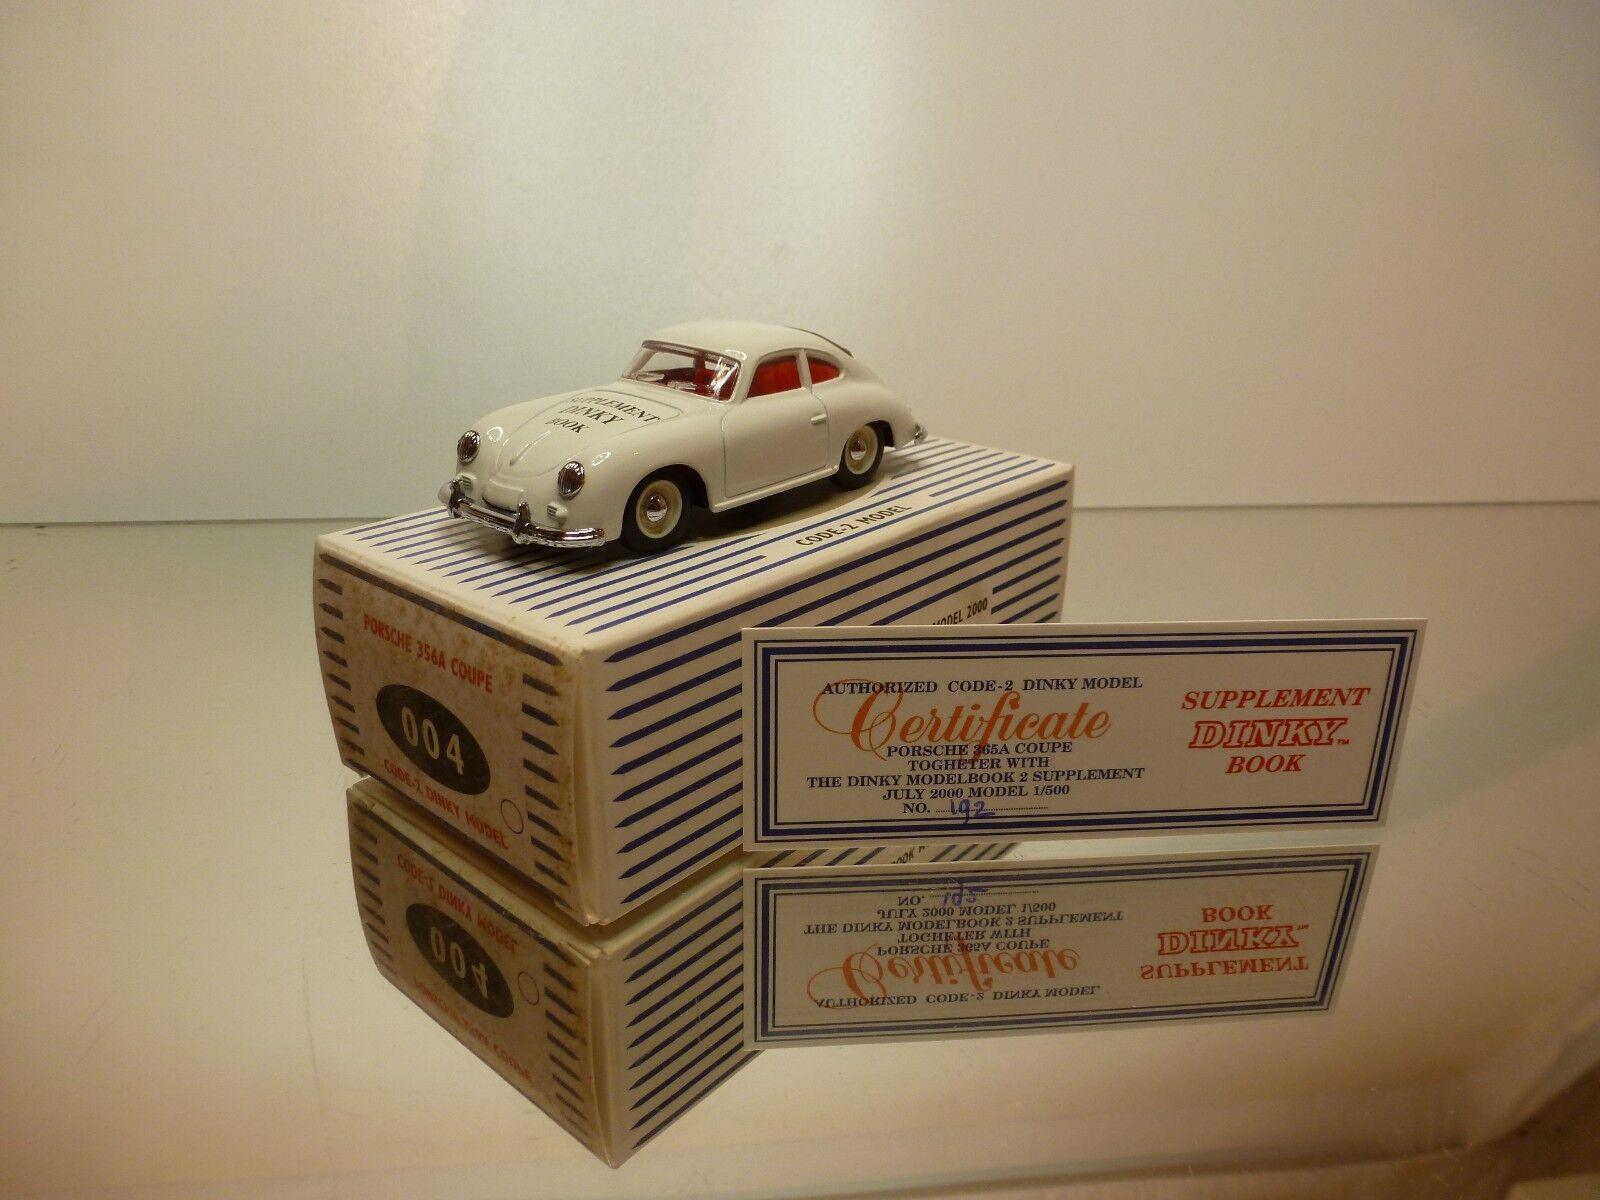 DINKY TOYS 004 PORSCHE 356A COUPE 1958 - WHITE WHITE WHITE 1 43 RARE - VERY GOOD IN BOX 4bc4a4